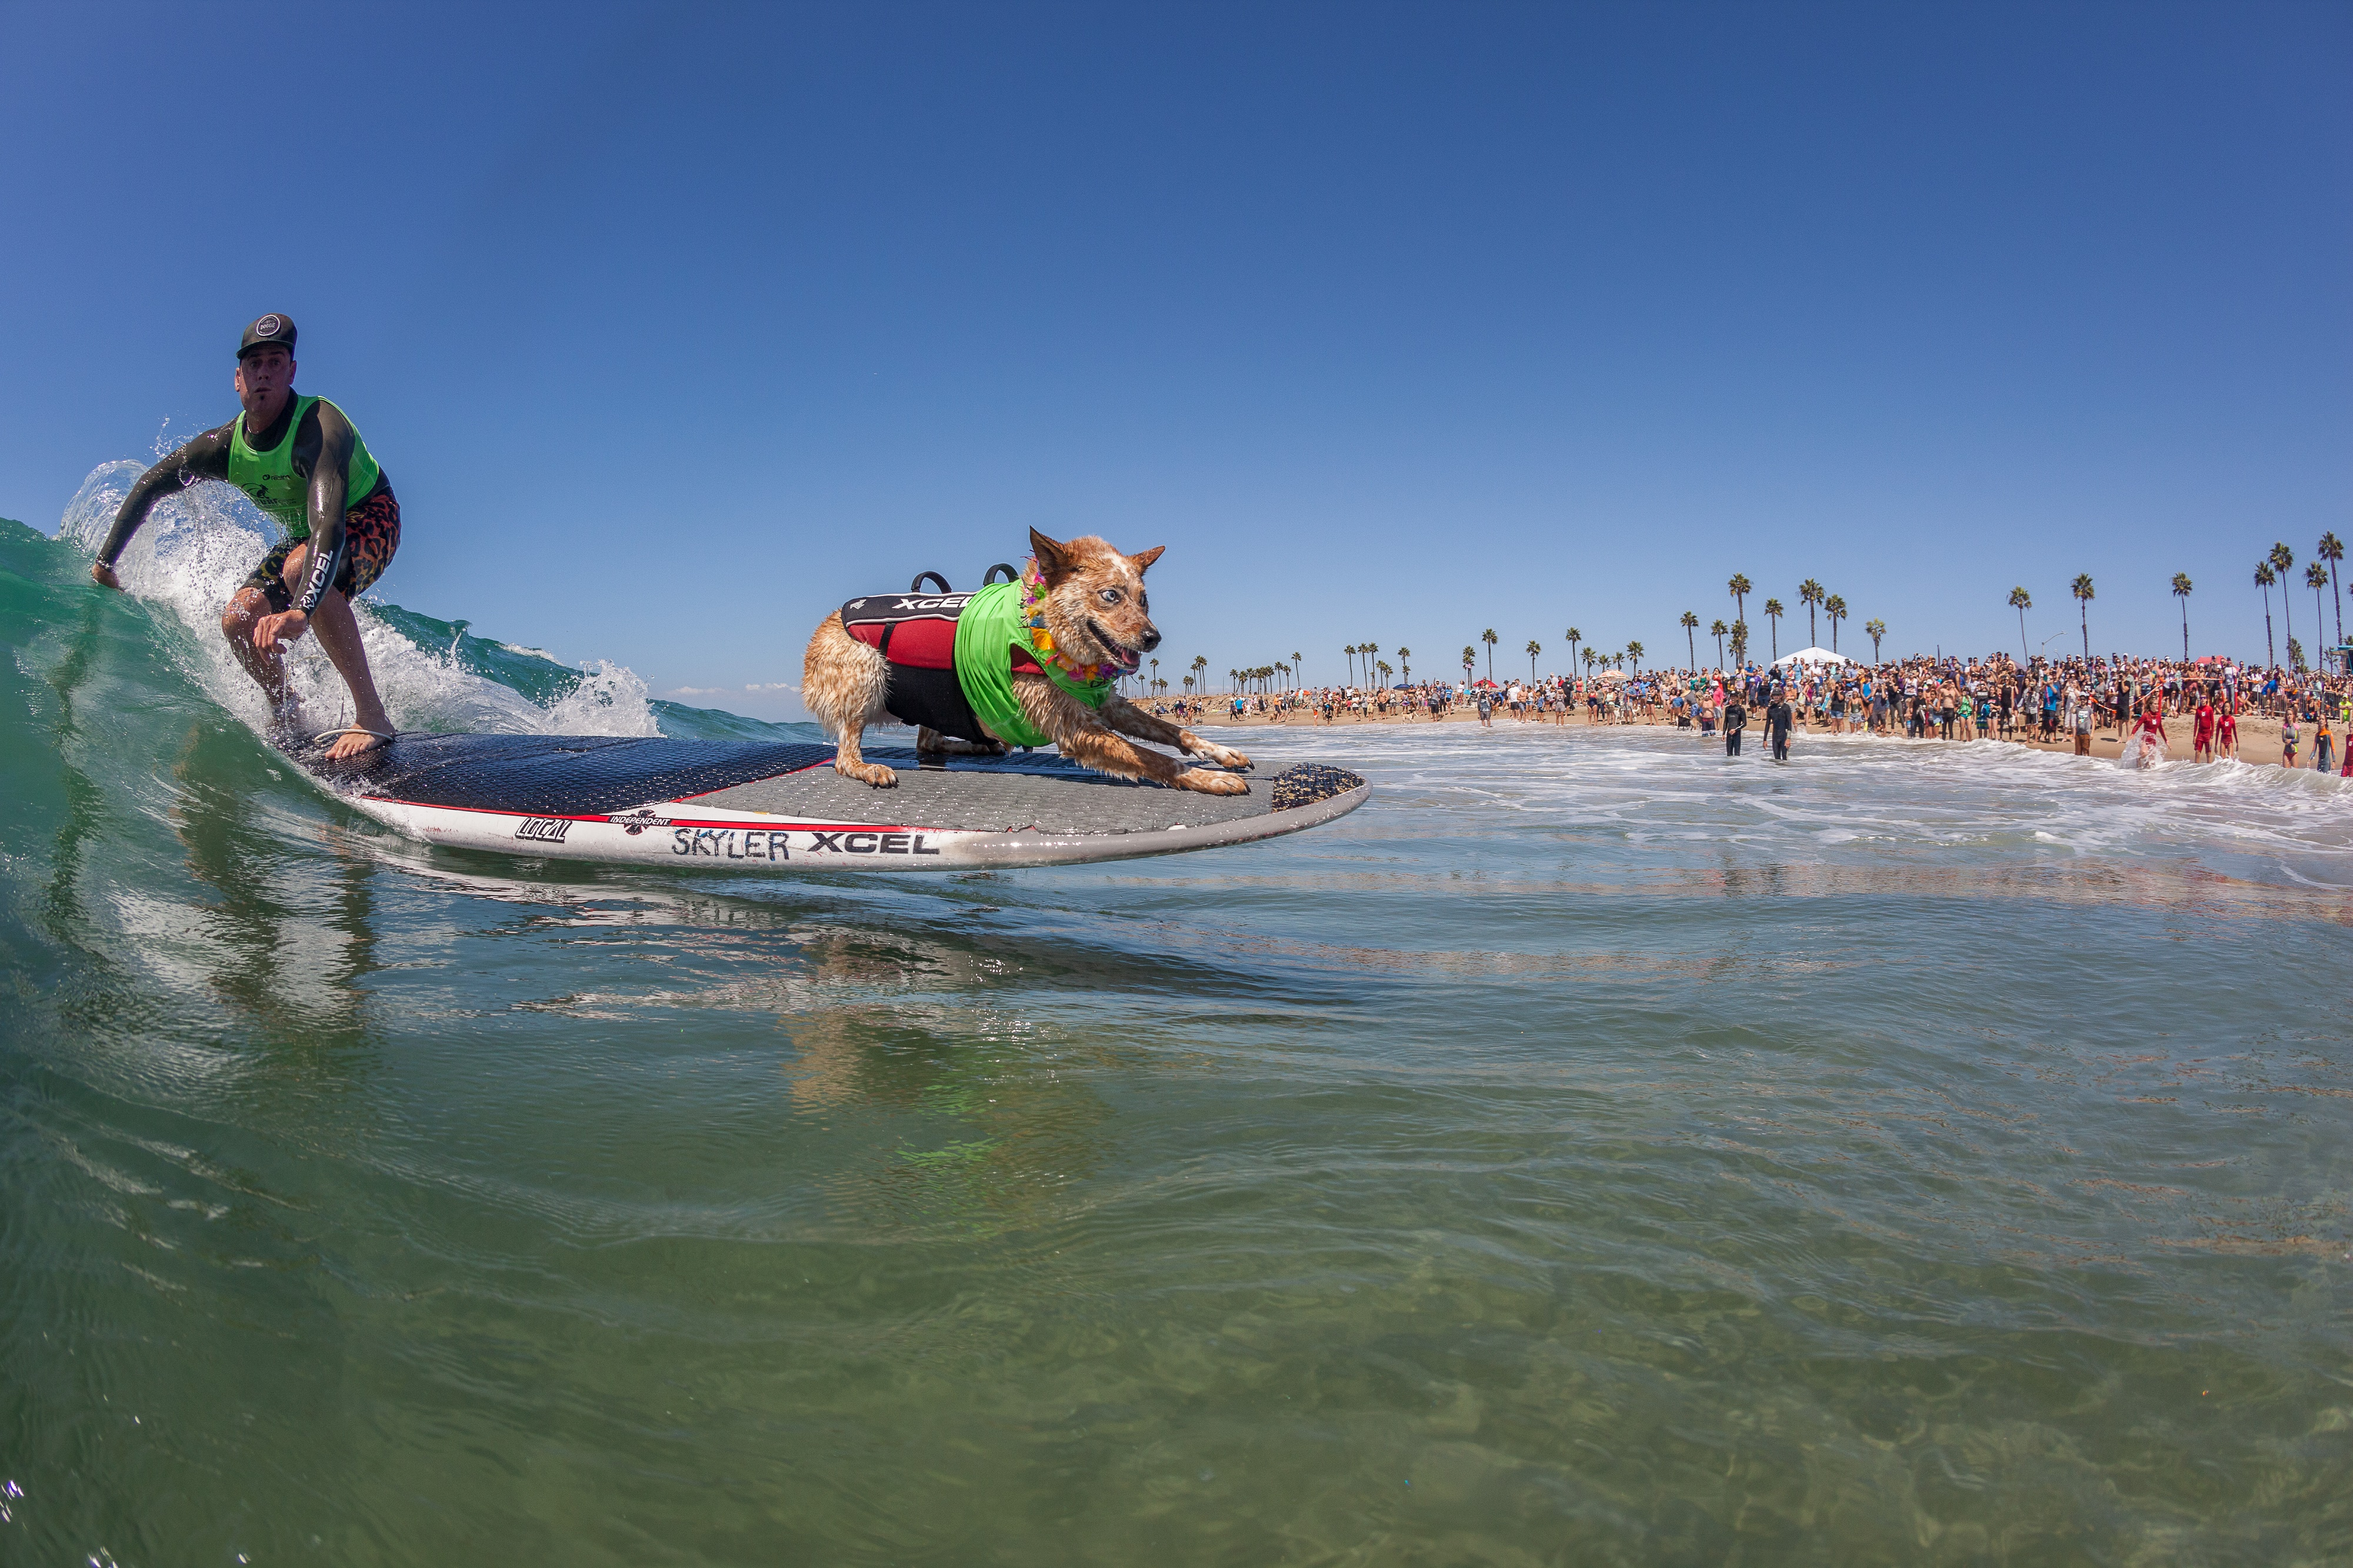 Skyler The Surf Dog Tandem Surfing With Human Photo By Daren Fentiman Huntington Beach